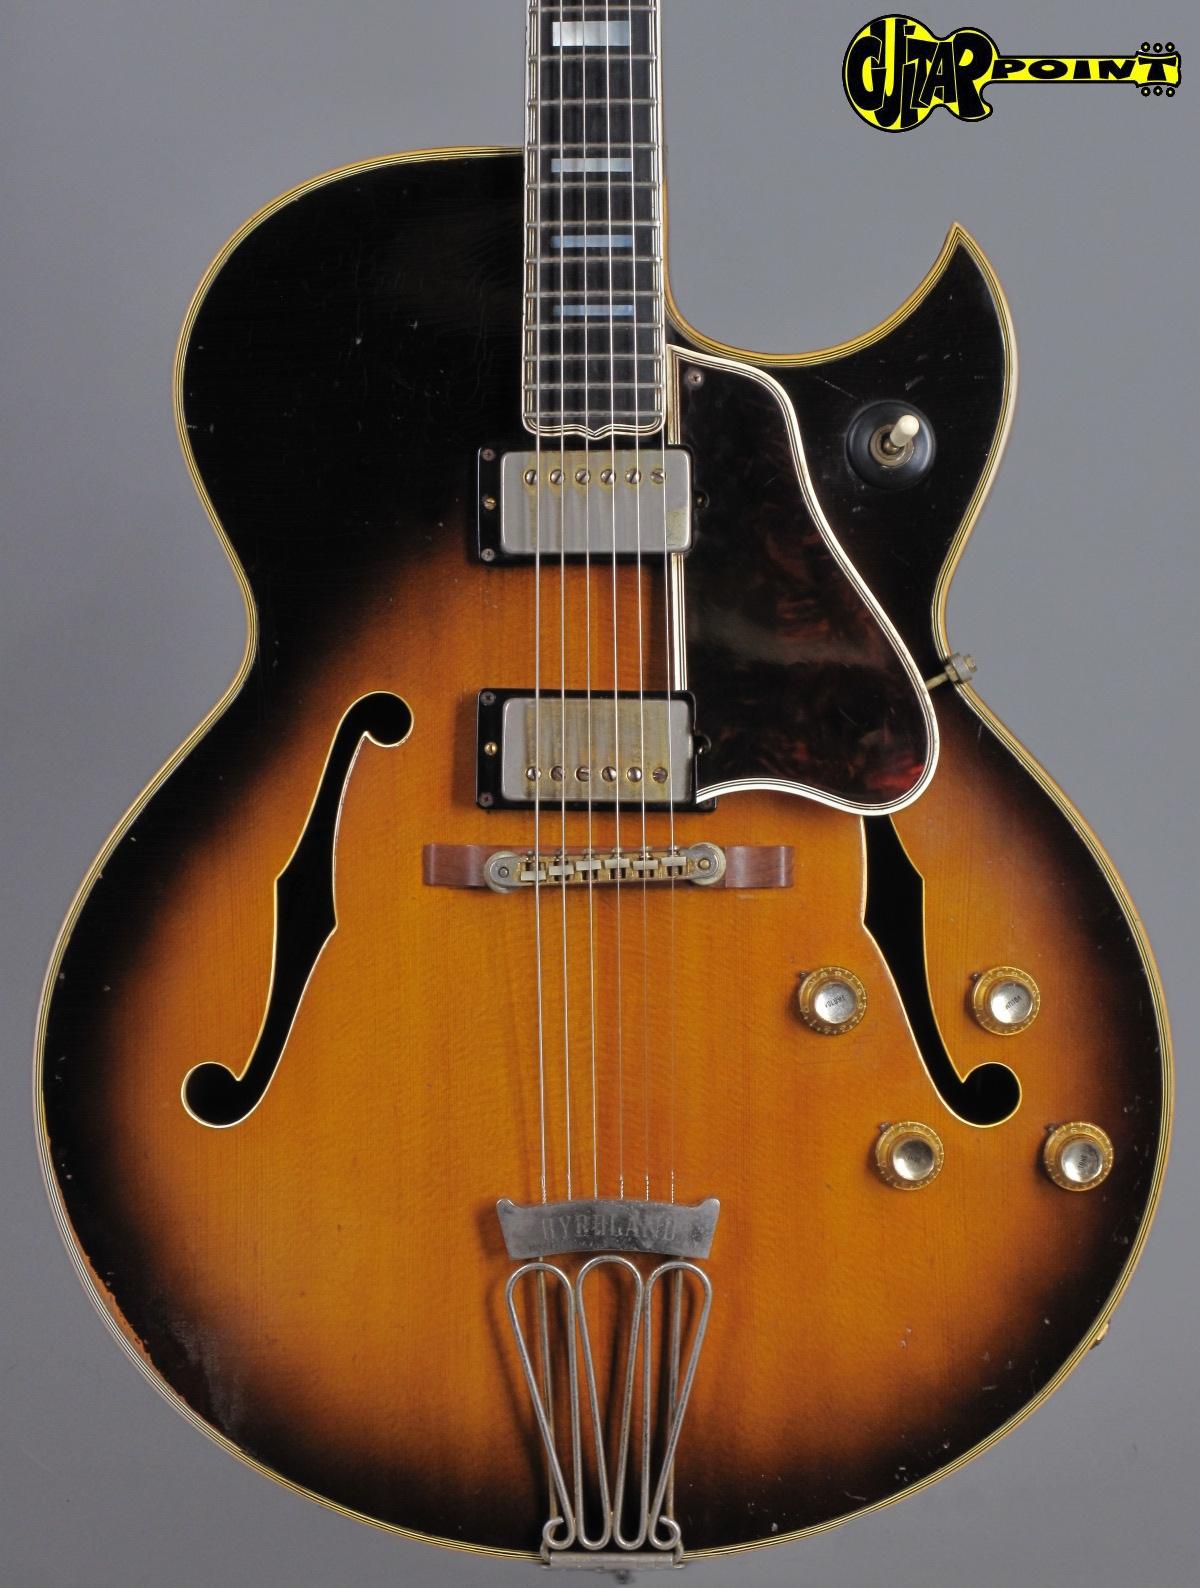 1966 Gibson Byrdland - Sunburst